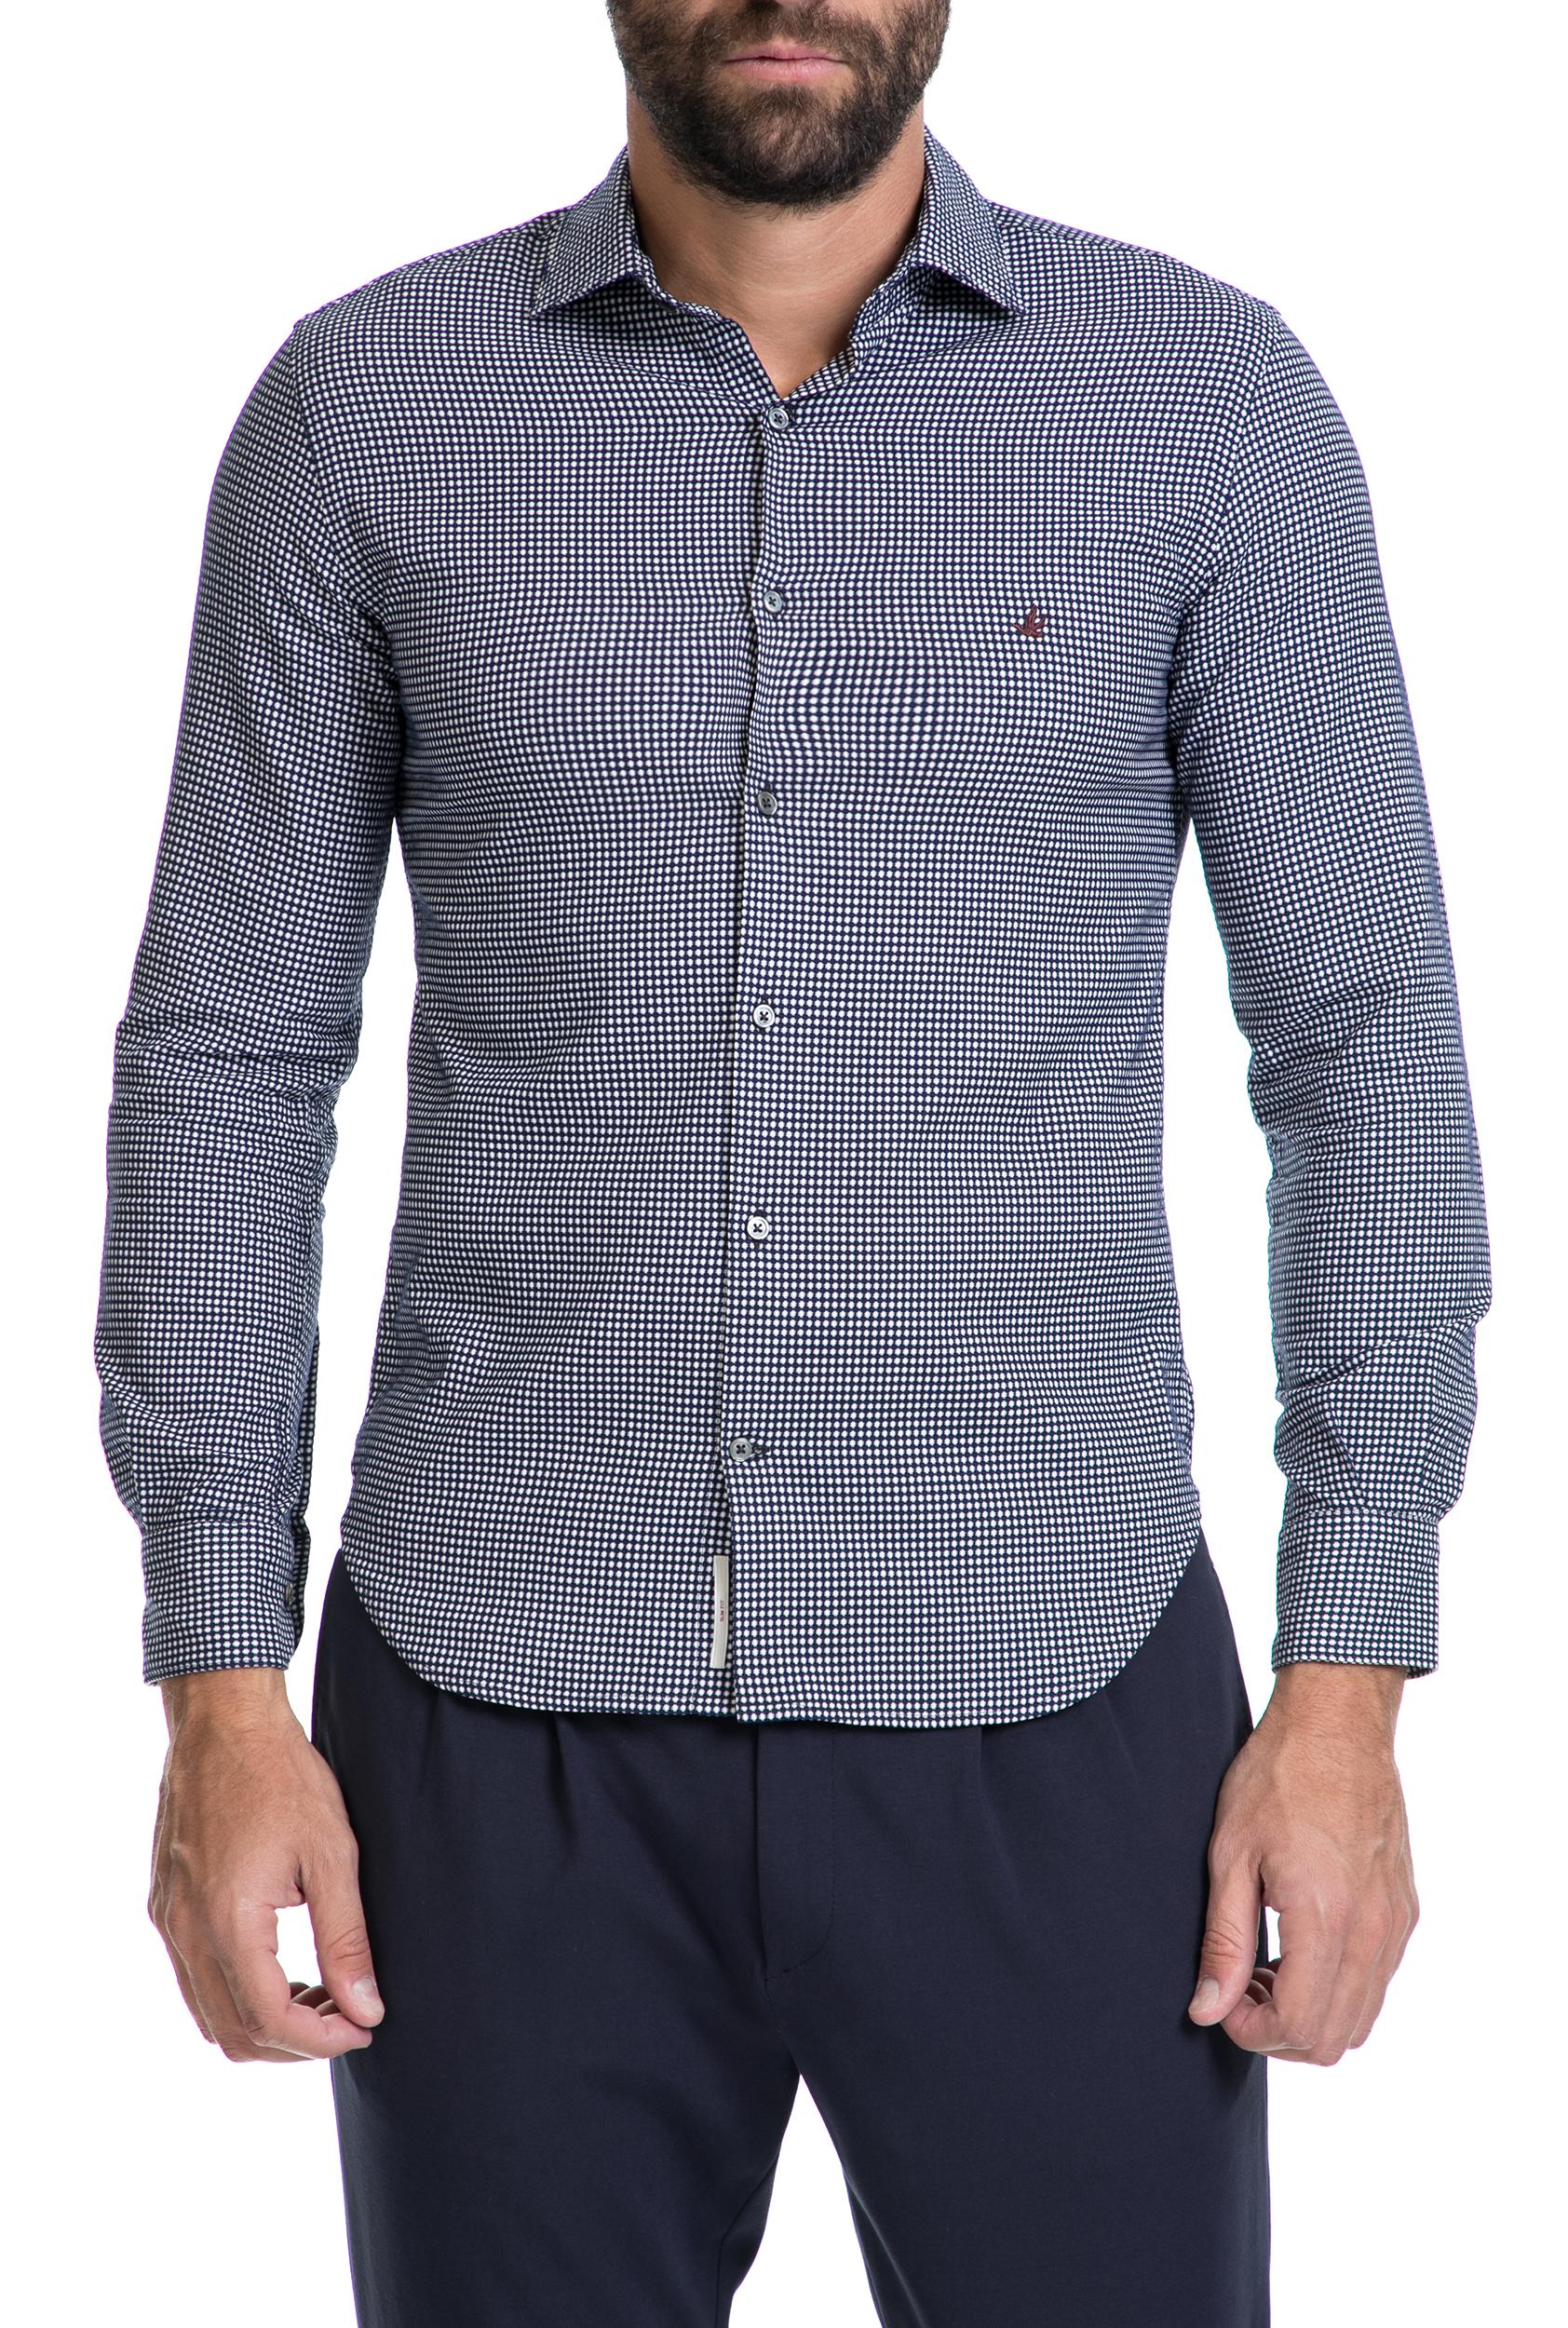 f59bfee6eafc BROOKSFIELD - Ανδρικό πουκάμισο BROOKSFIELD άσπρο-μπλε 1574831.0-1191